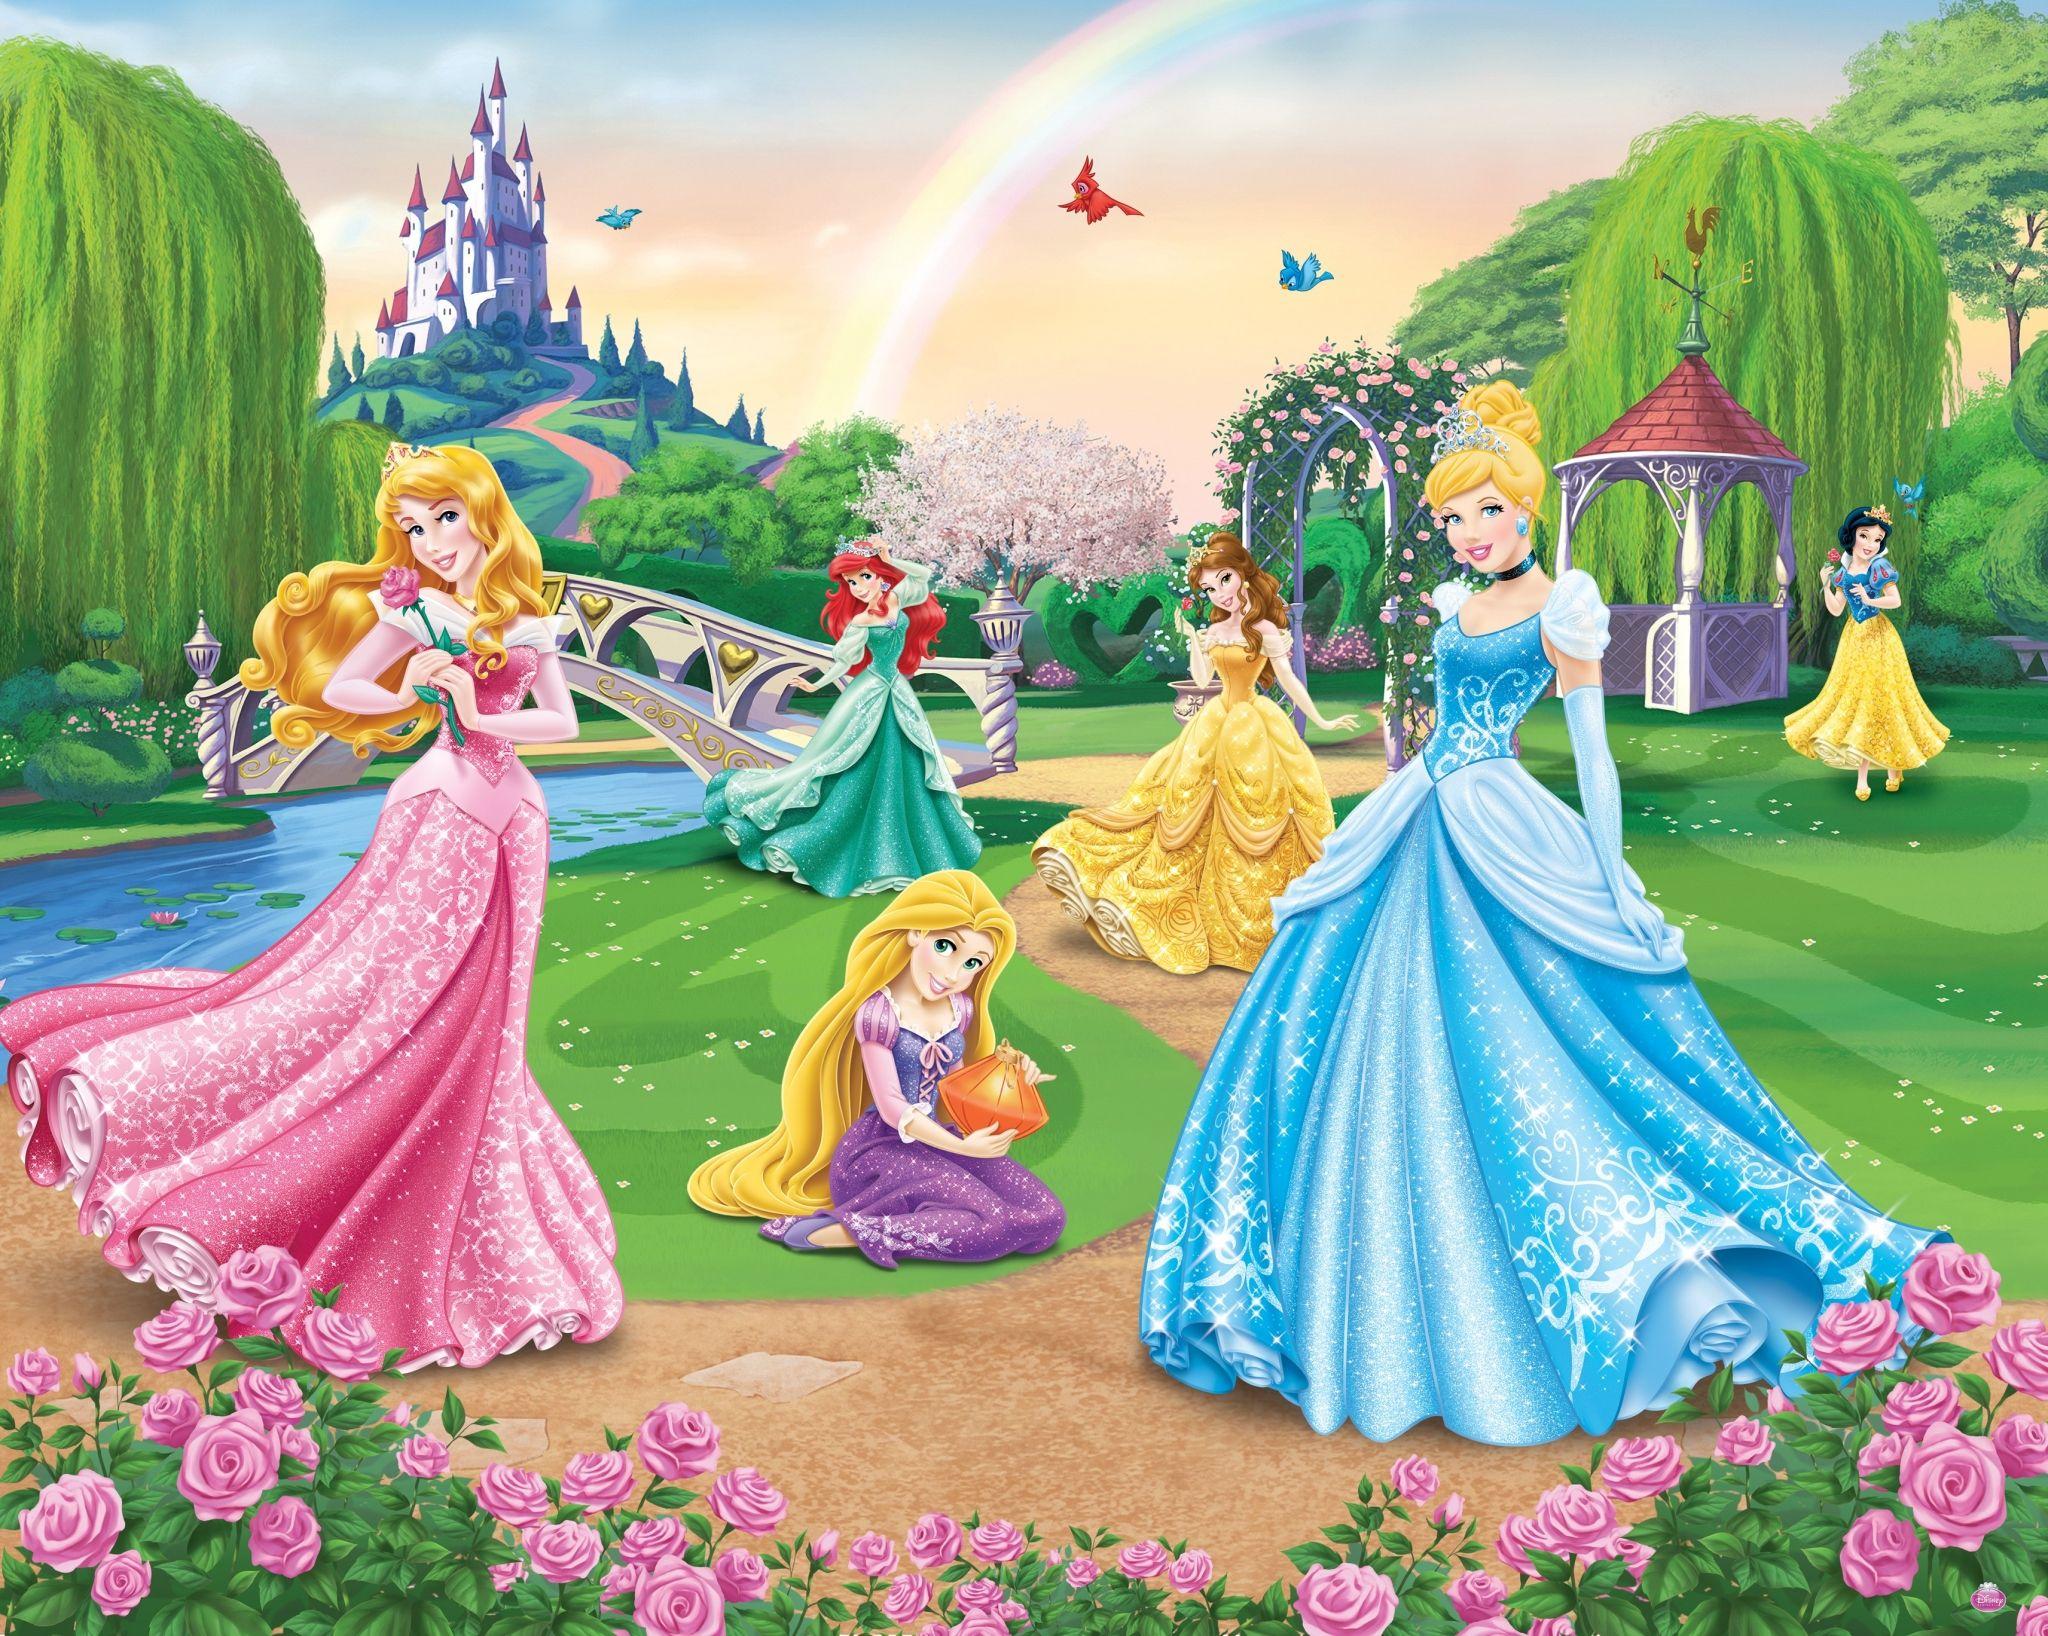 Disney Wallpapers For Mac Desktop